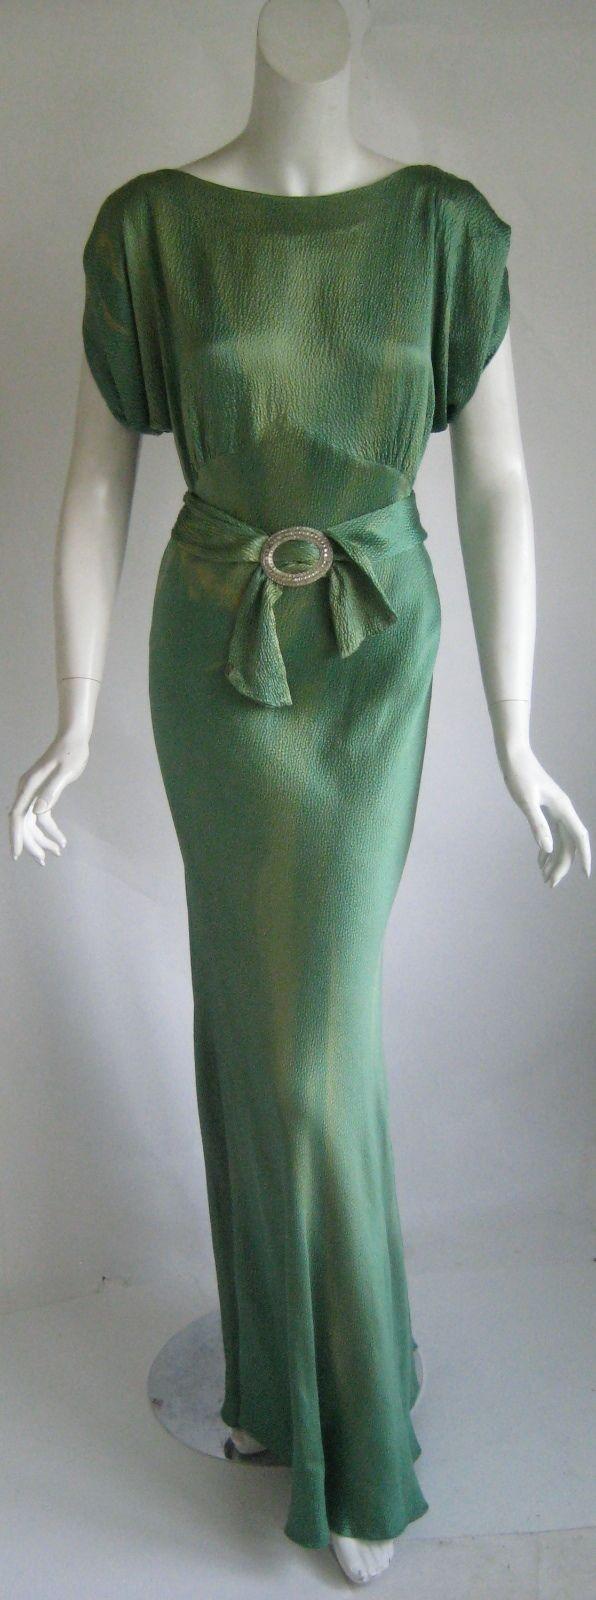 vintage 1930s art deco numbered screen star bias cut silk goddess evening gown(150)